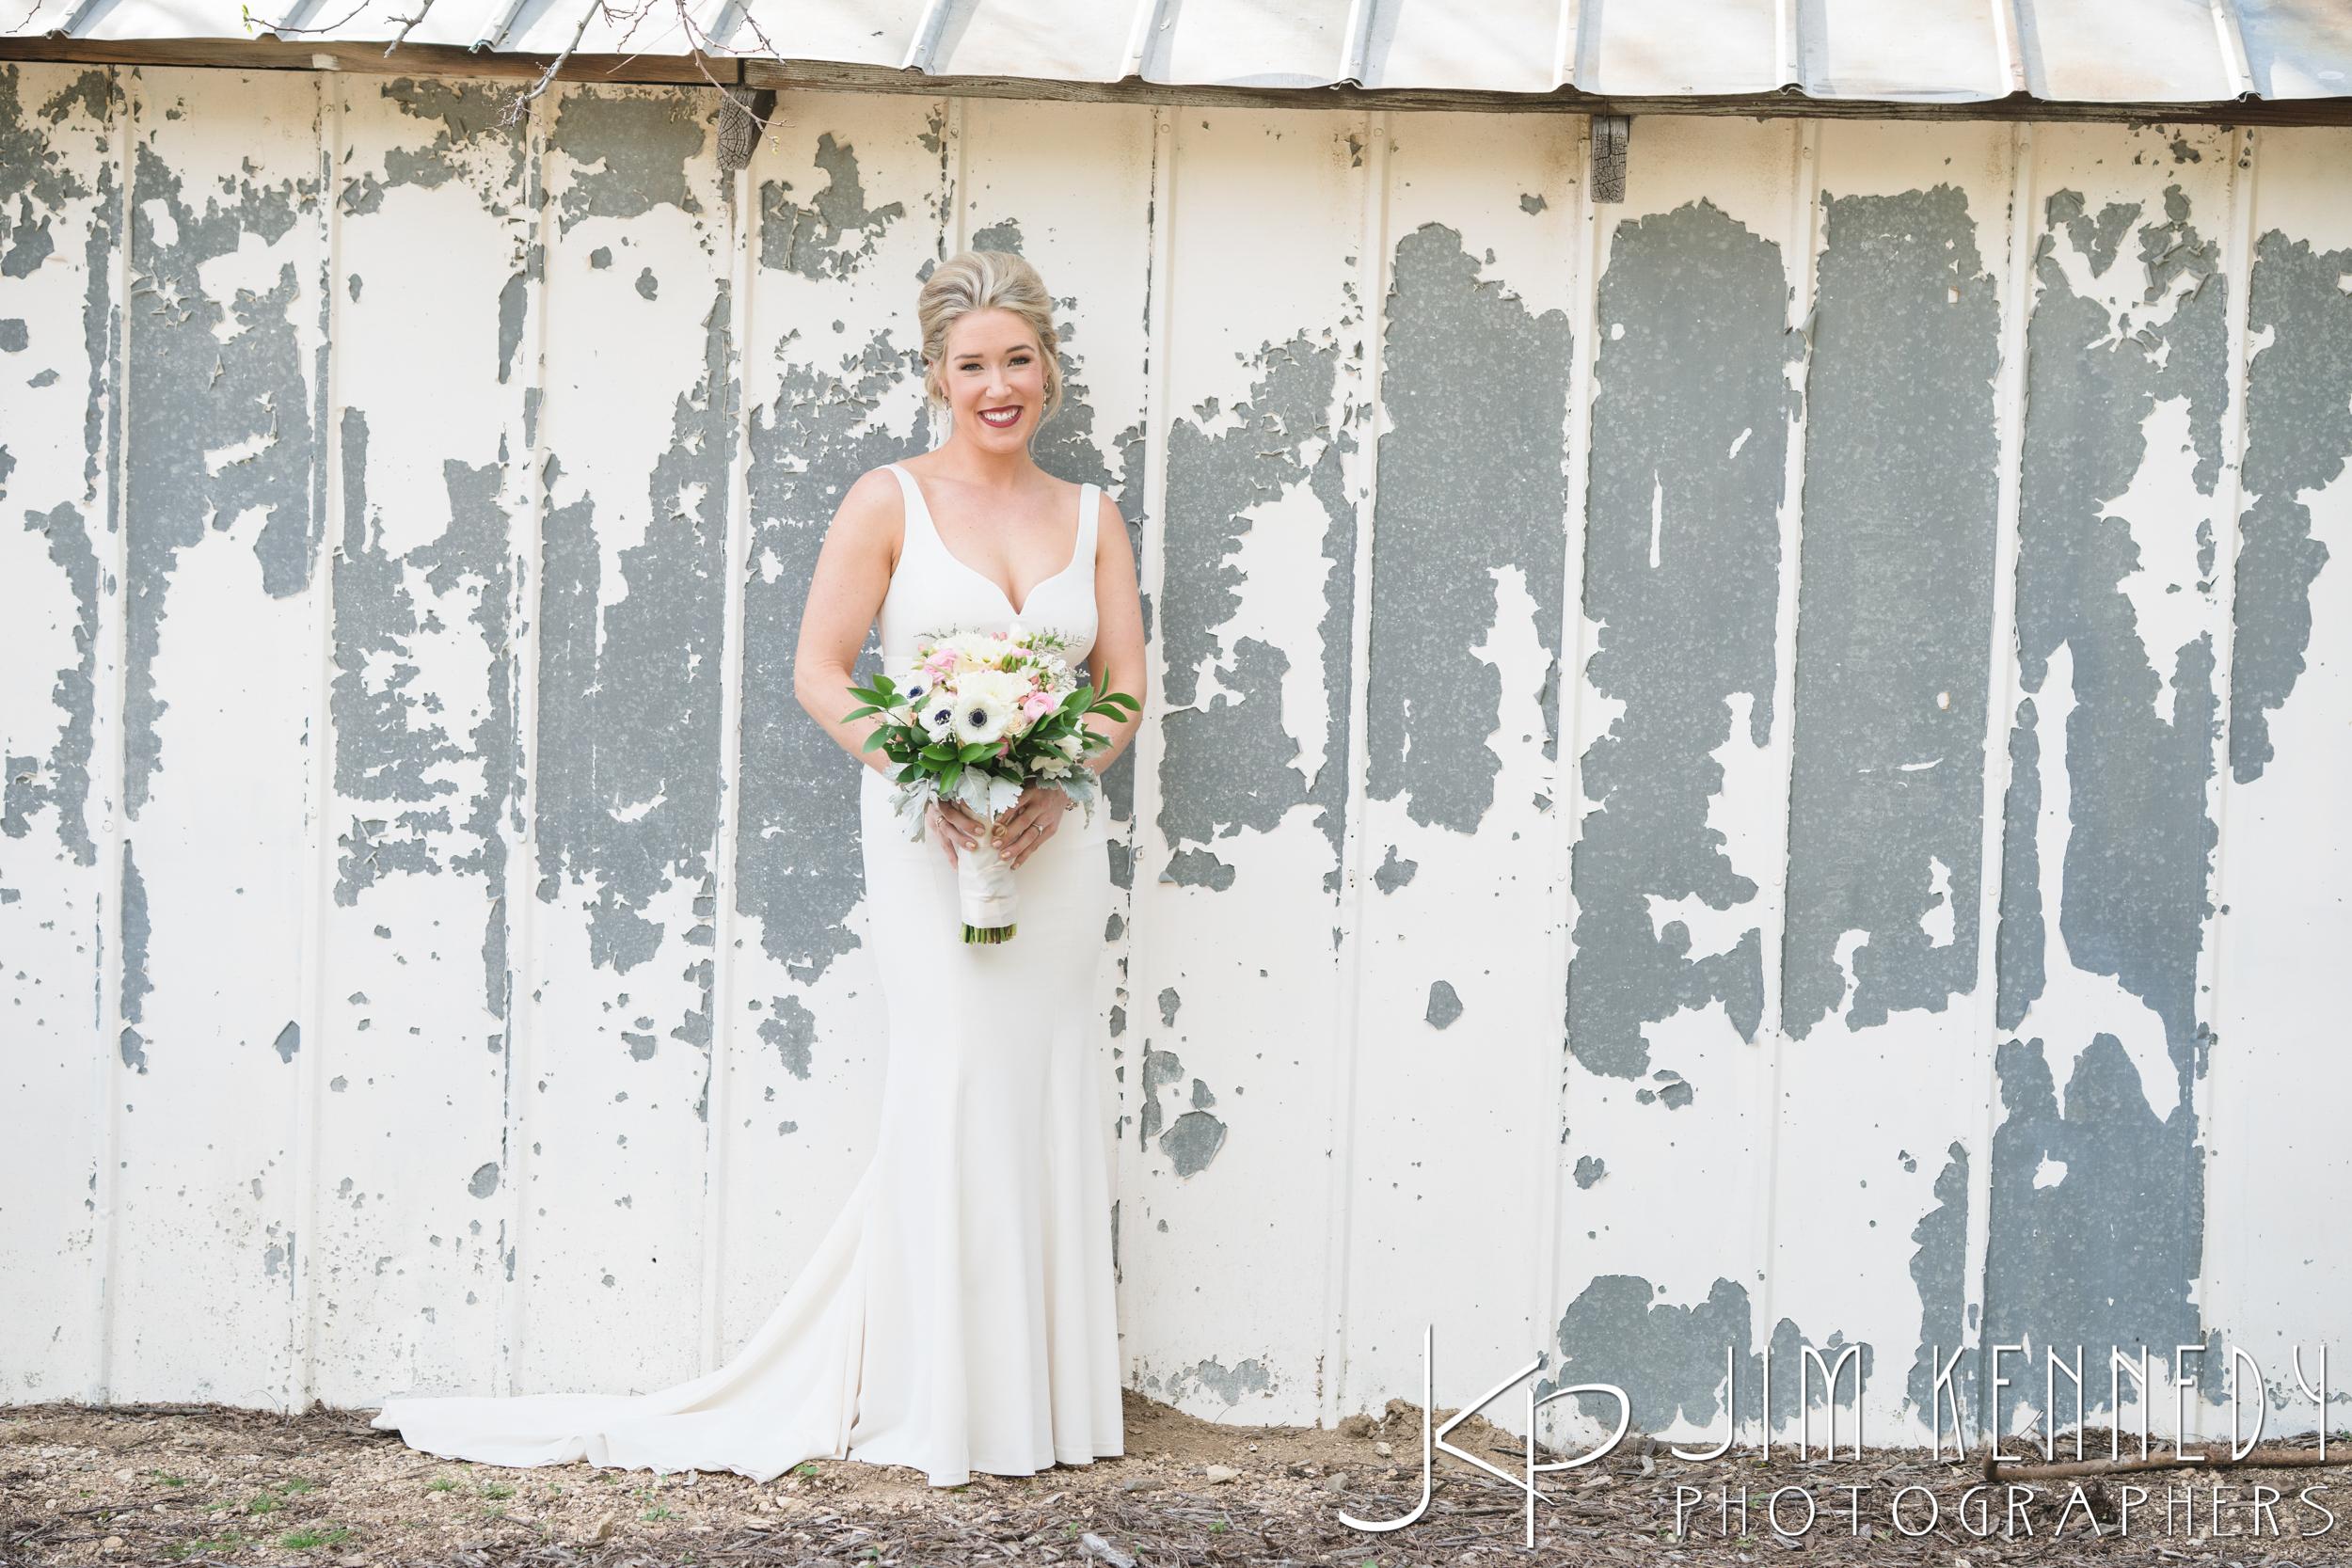 jim_kennedy_photographers_highland_springs_wedding_caitlyn_0075.jpg